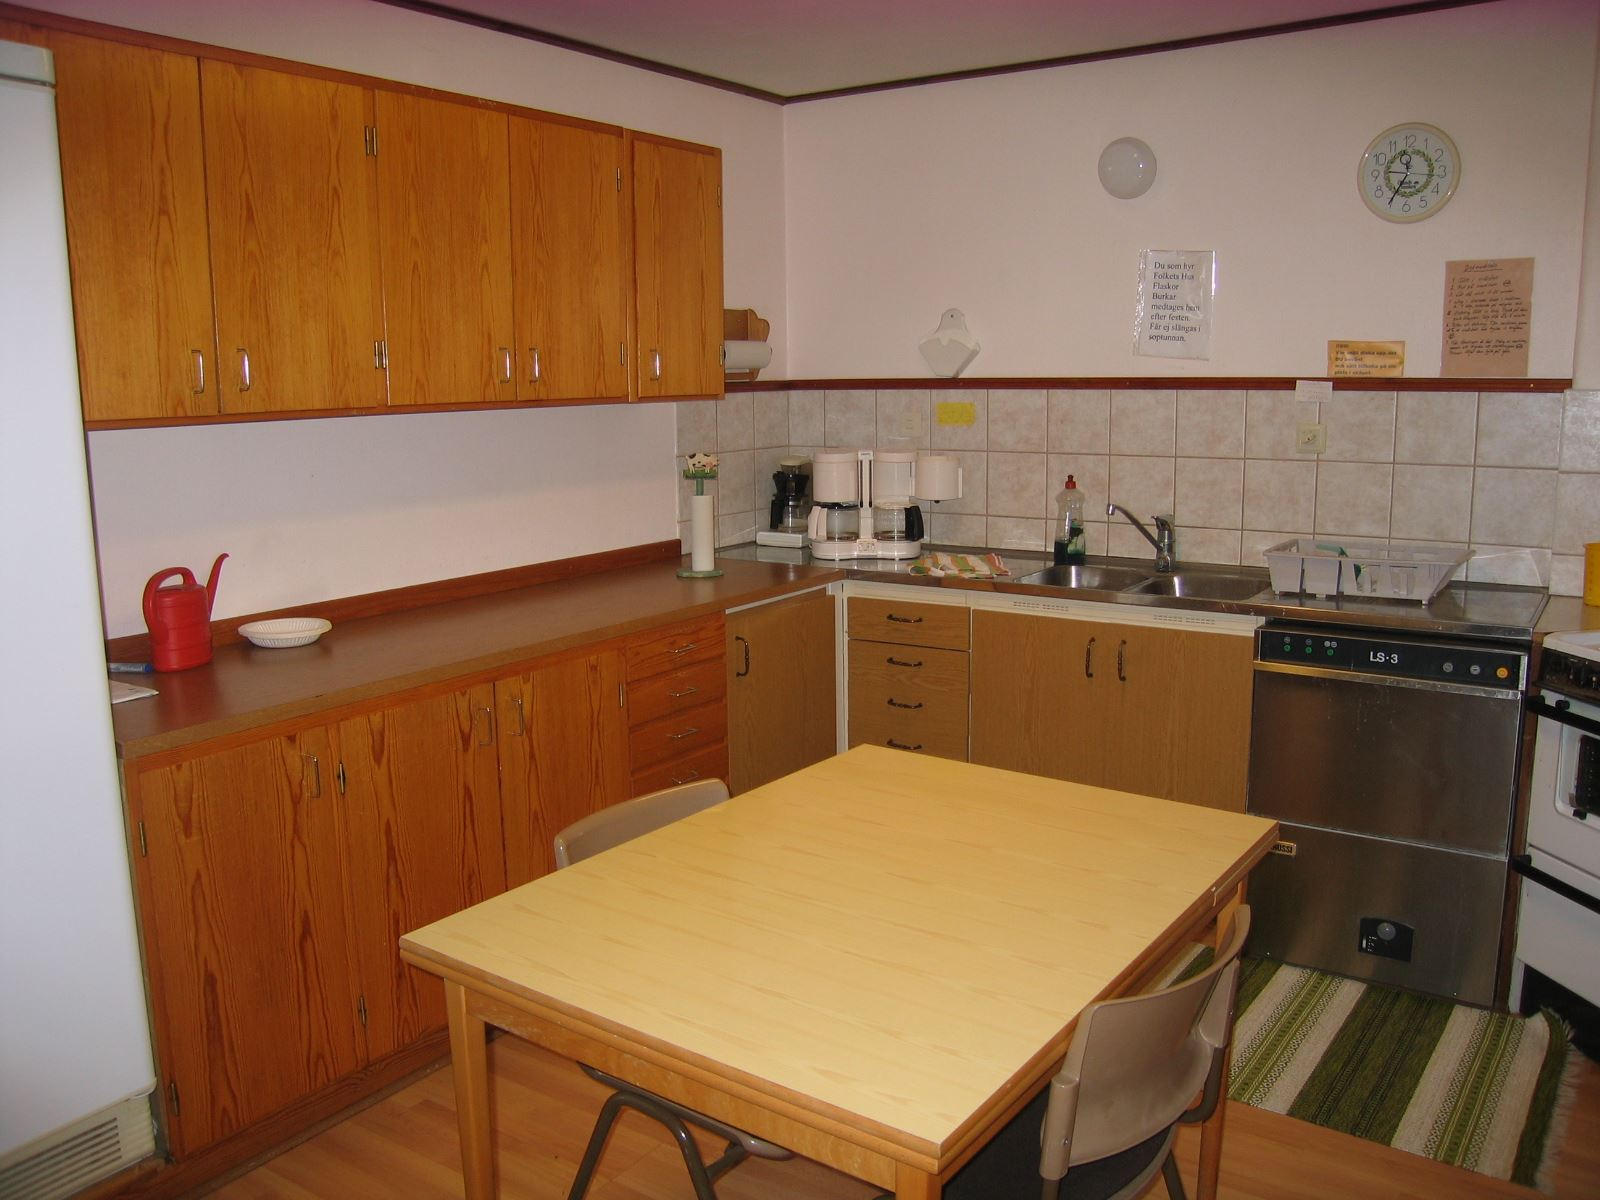 Mysig stuga i Saxns, land - Cabins for Rent in Mrbylnga